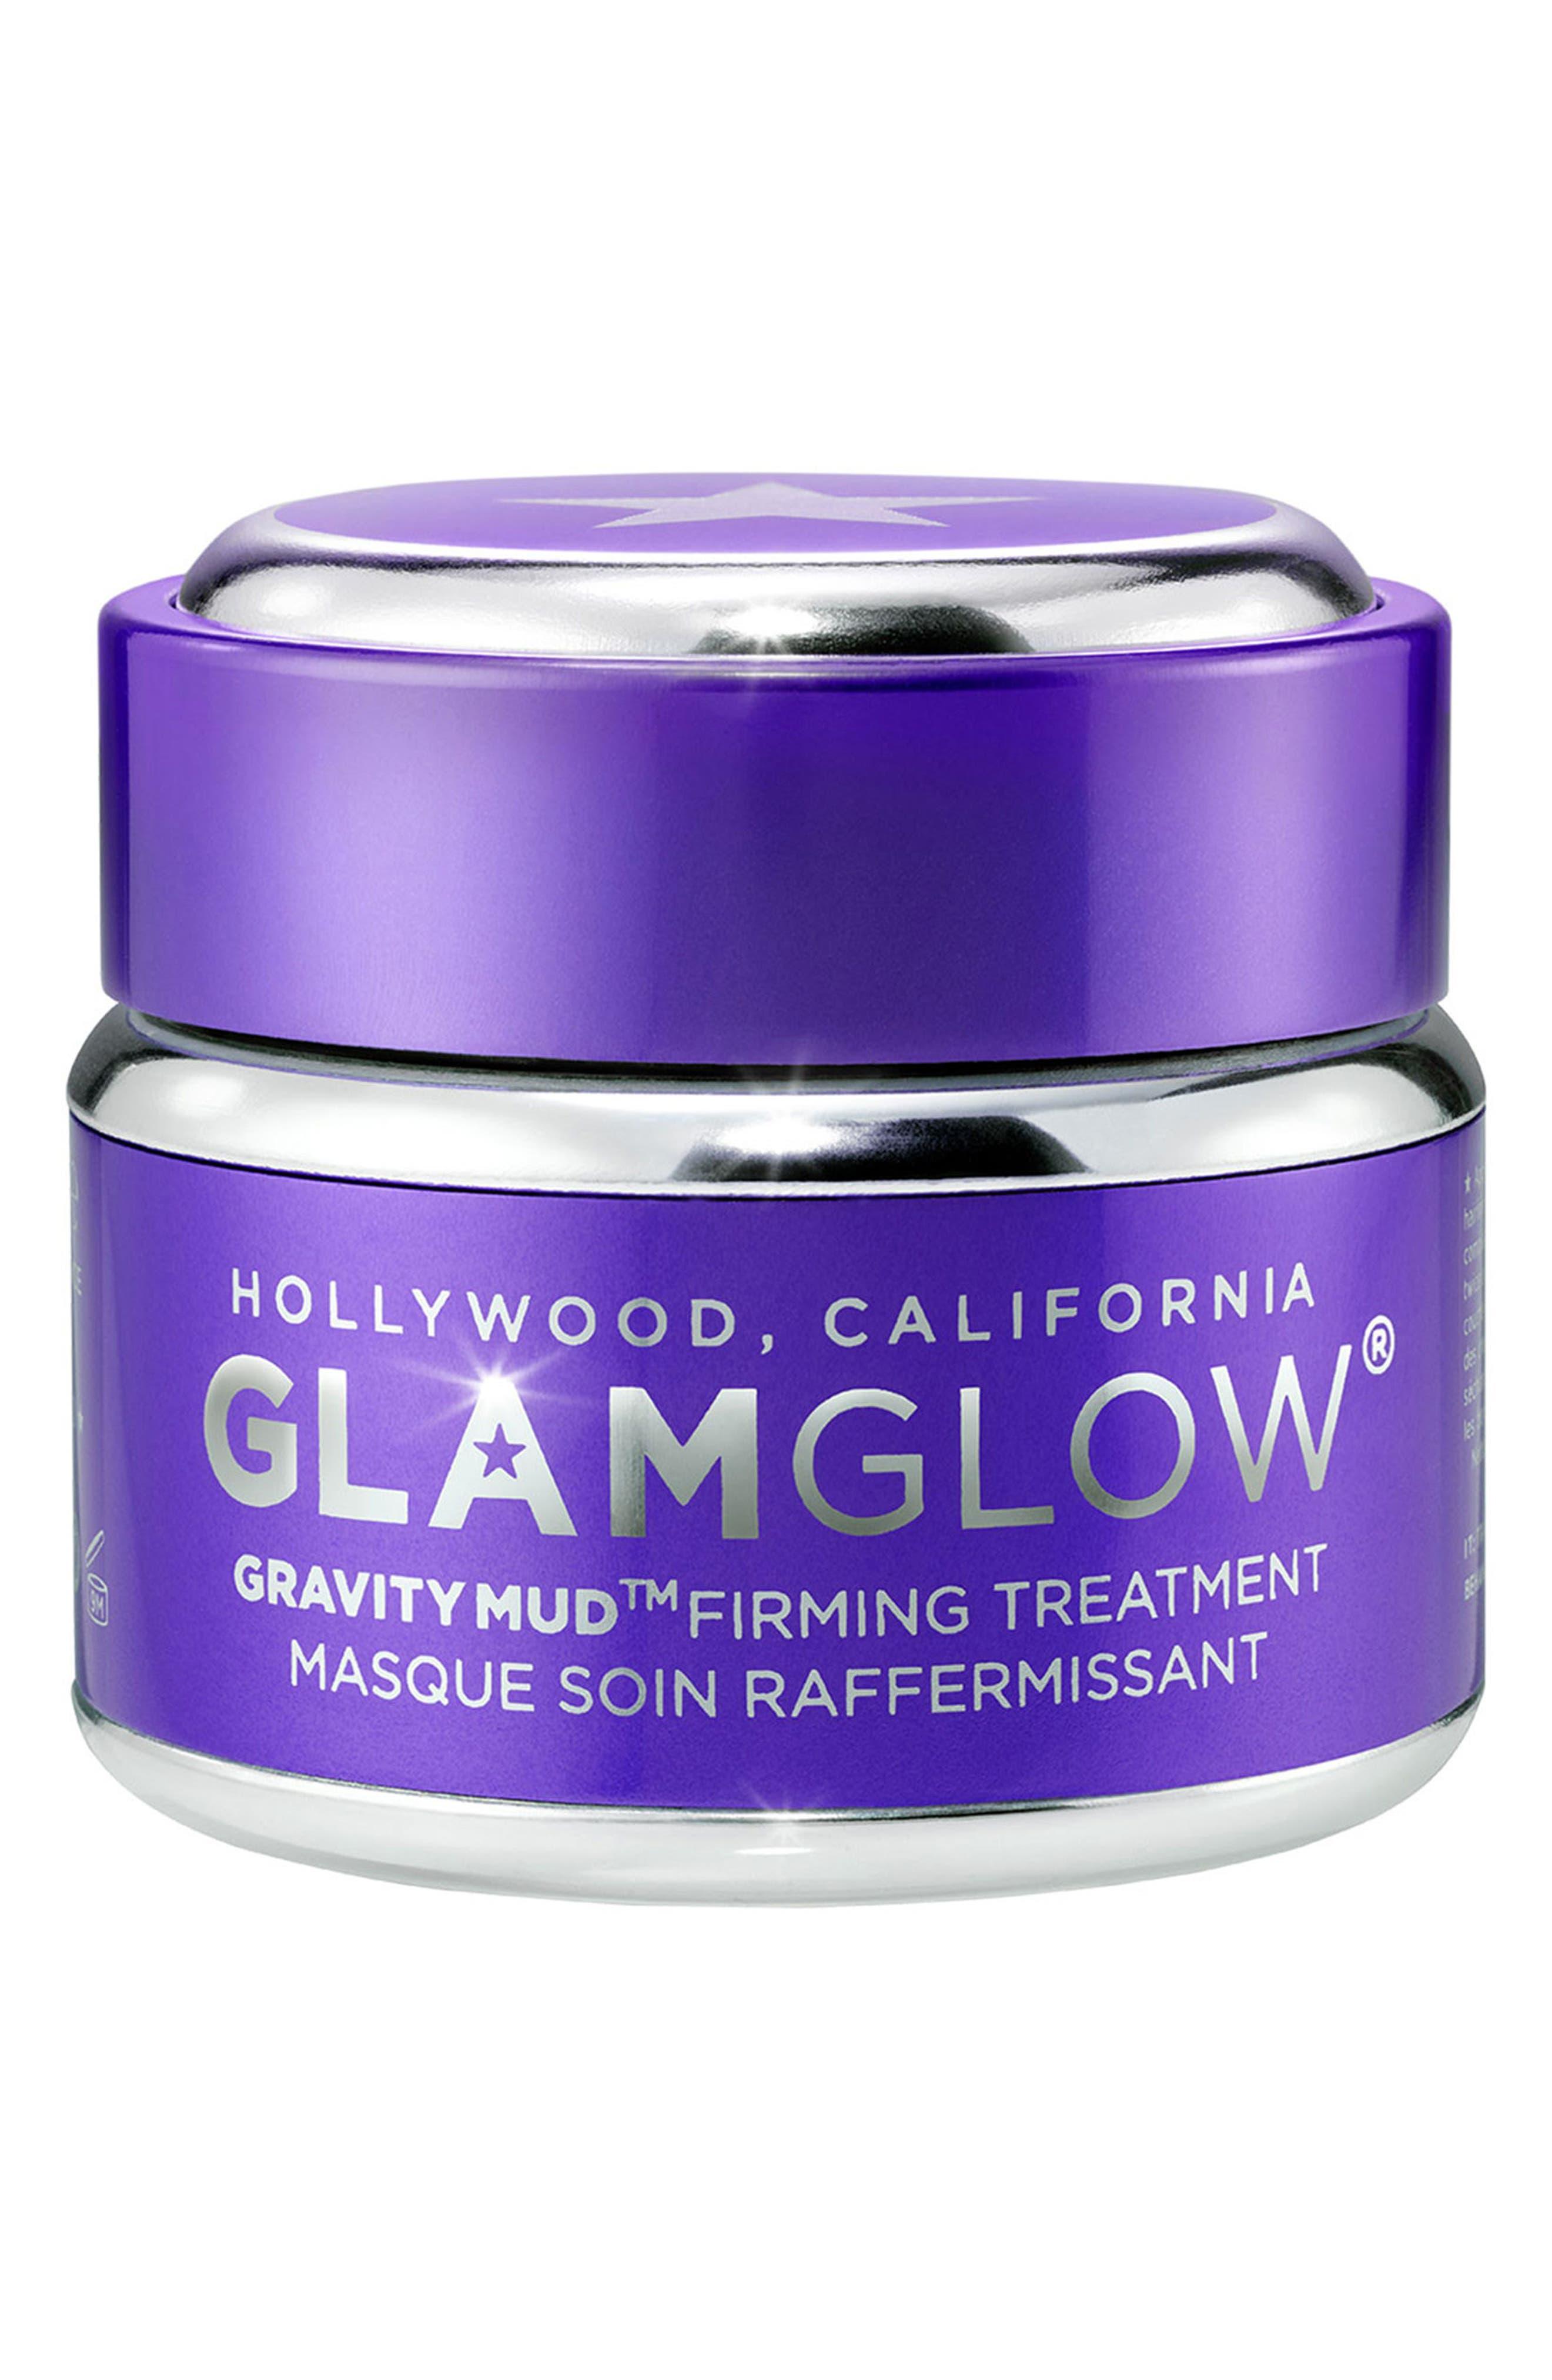 Glamglow Gravitymud(TM) Firming Treatment Mask